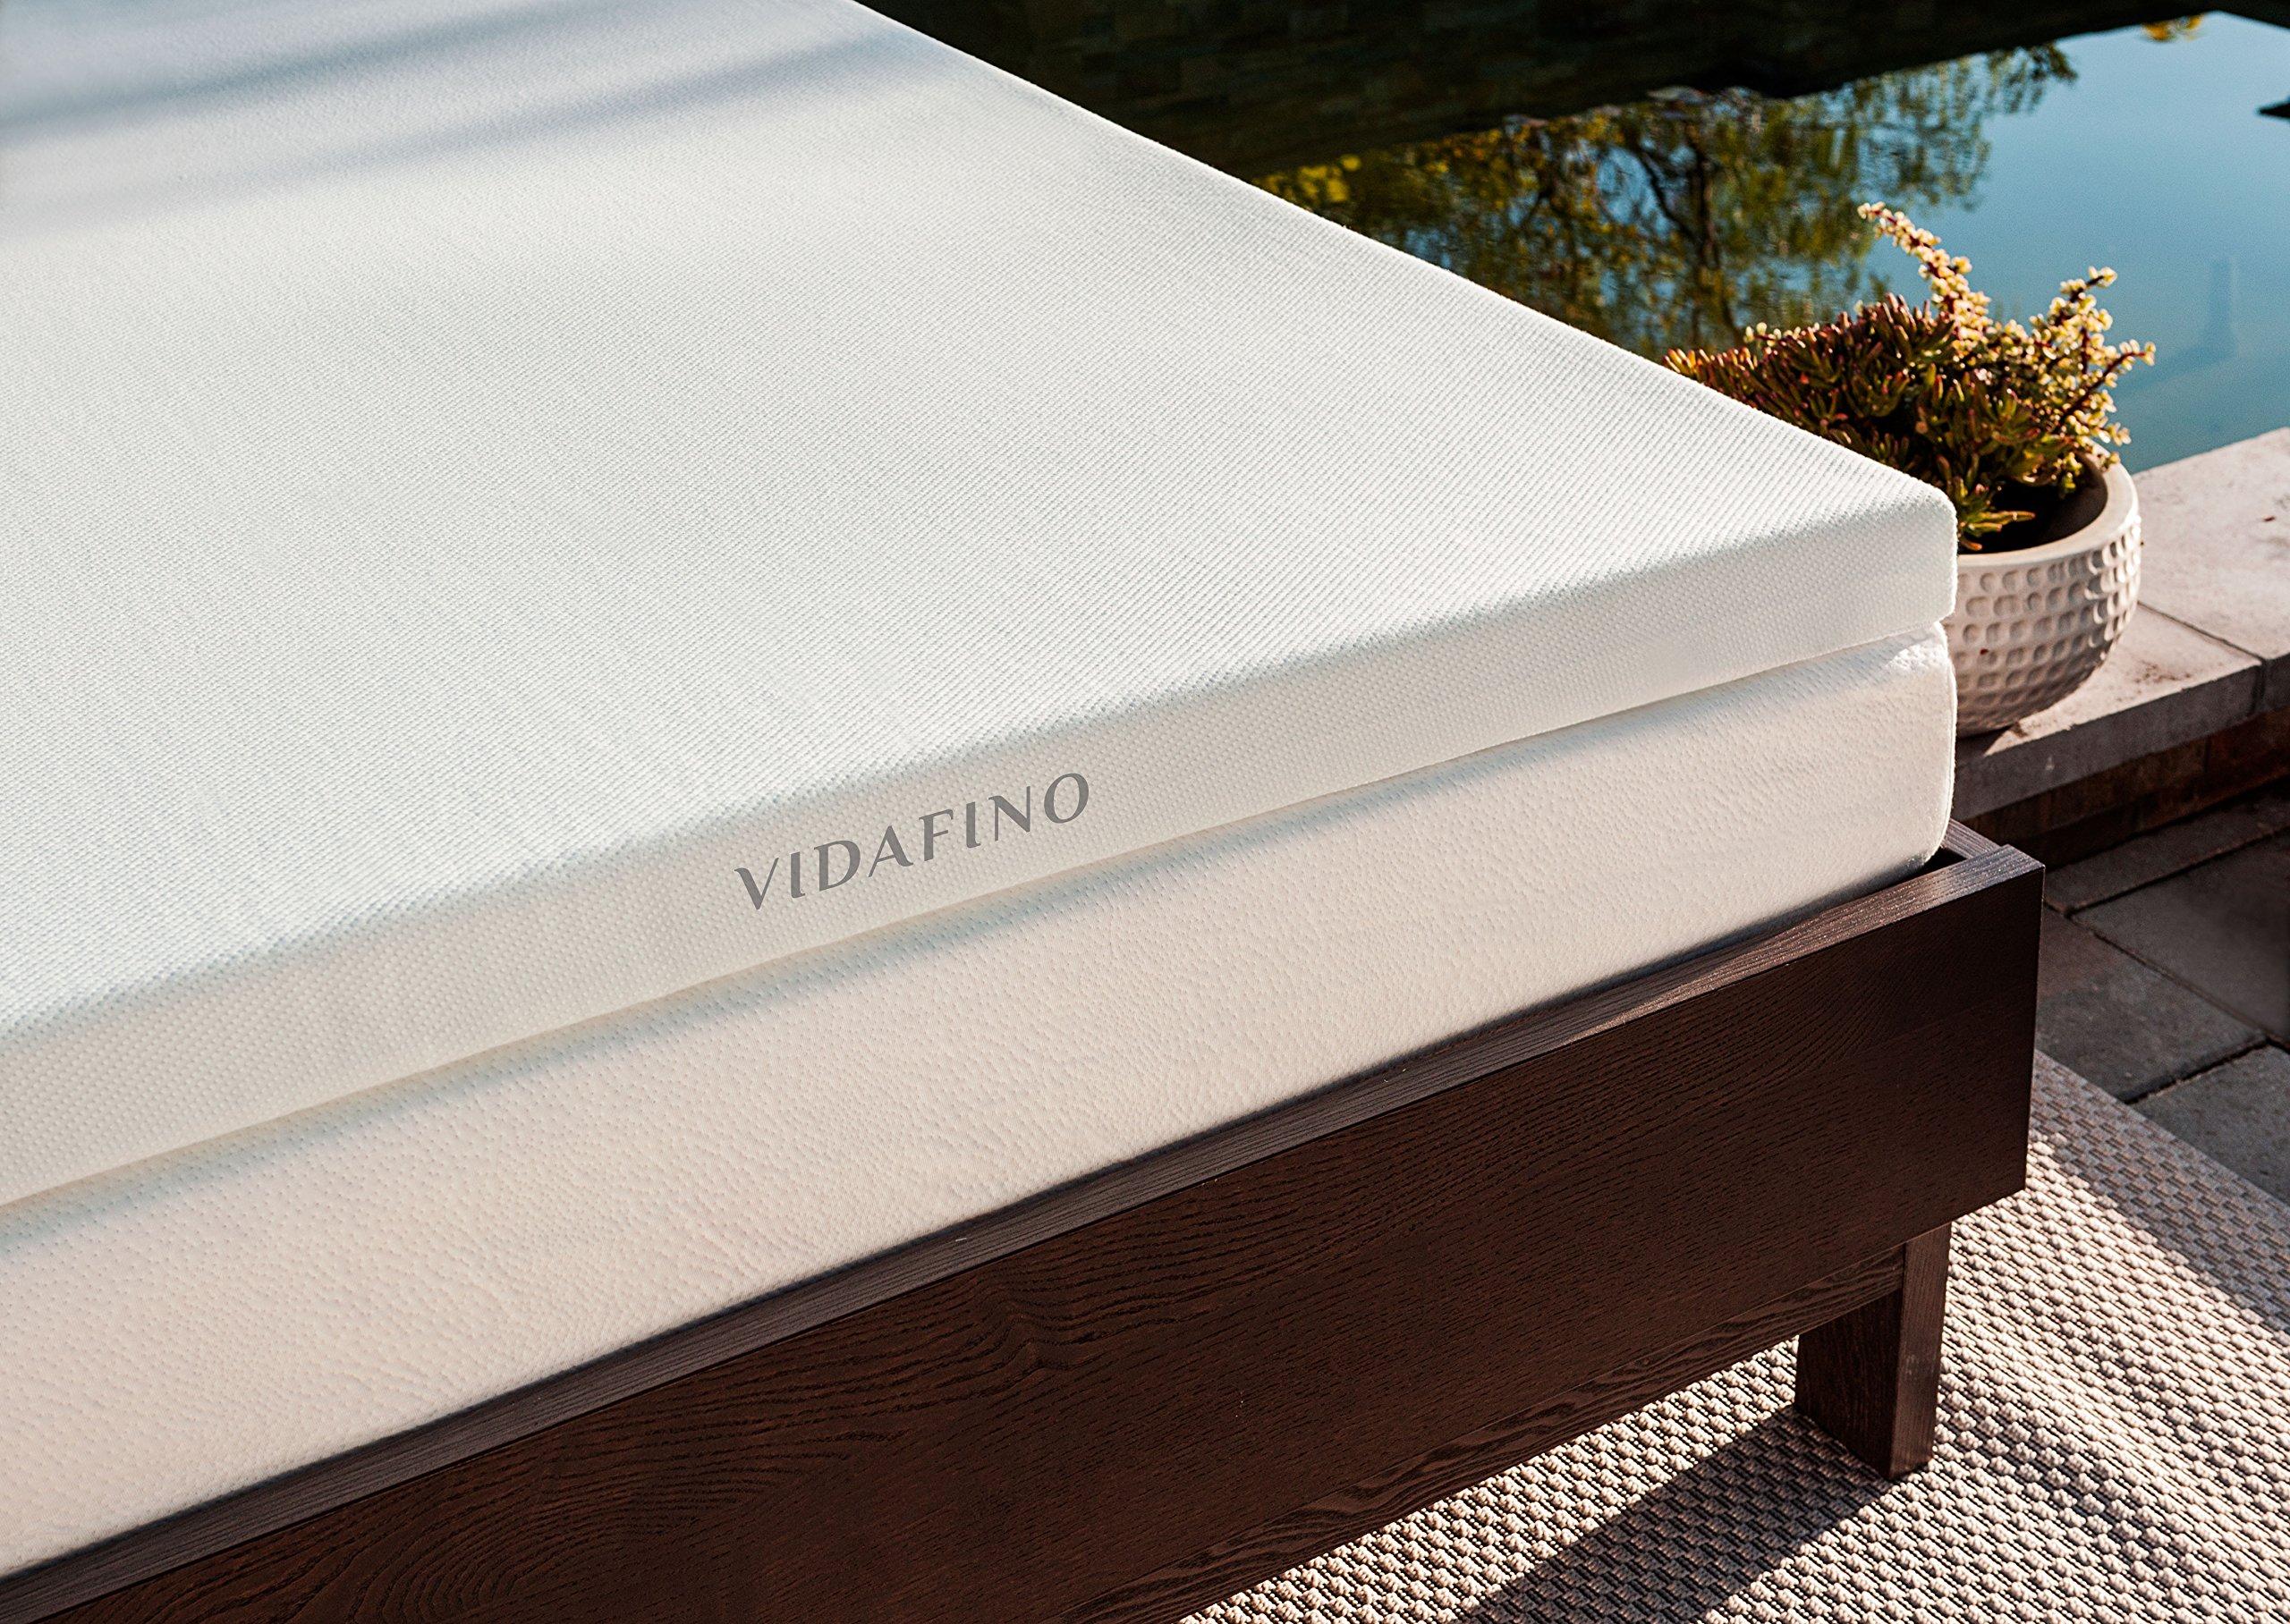 Vidafino 4'' Inch AeroBreathe® Gel Infused Reactive Memory Foam Mattress Topper - No-Risk 45 Day Trial & 5-Year Warranty - CertiPUR & Oeko-tex Certified (Full)